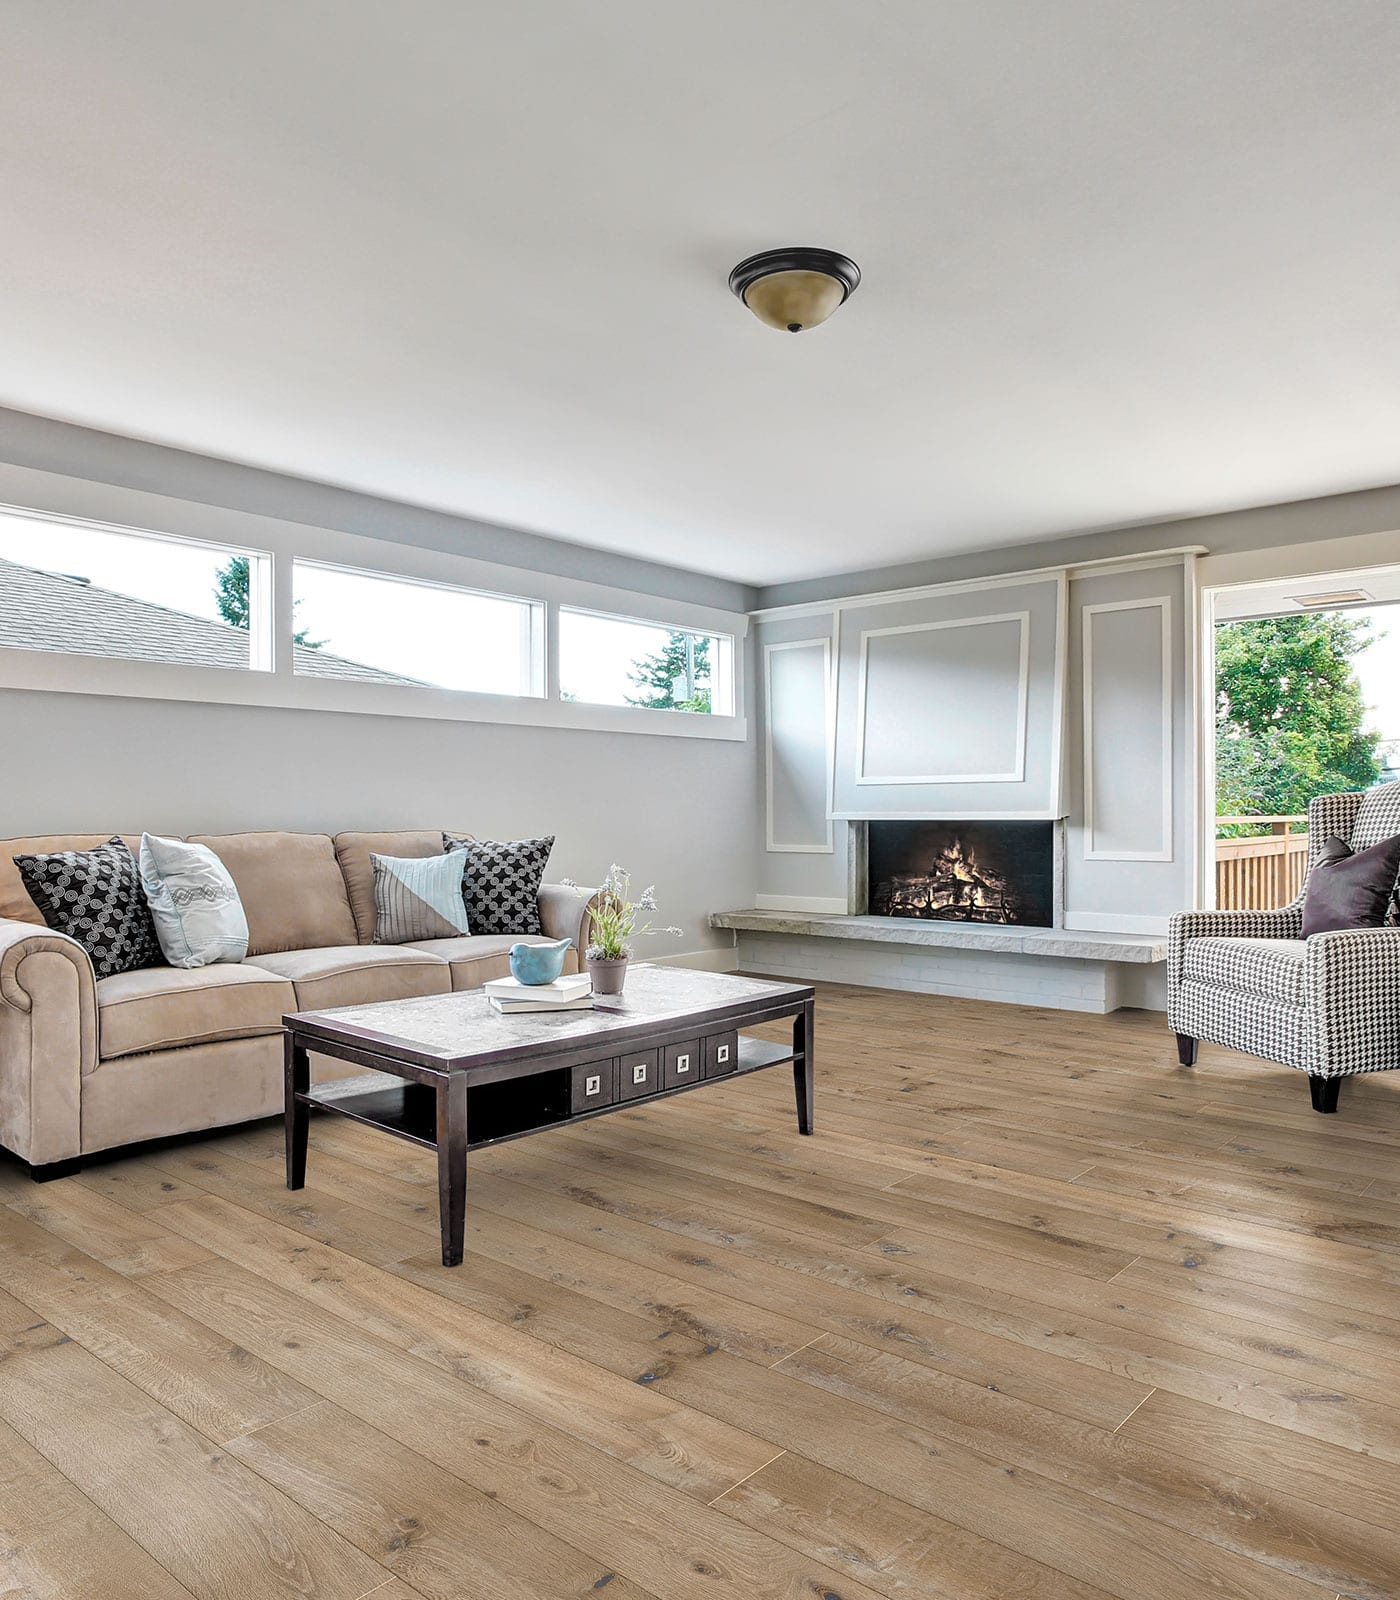 Moorea-european Oak floors-Lifestyle Collection-room